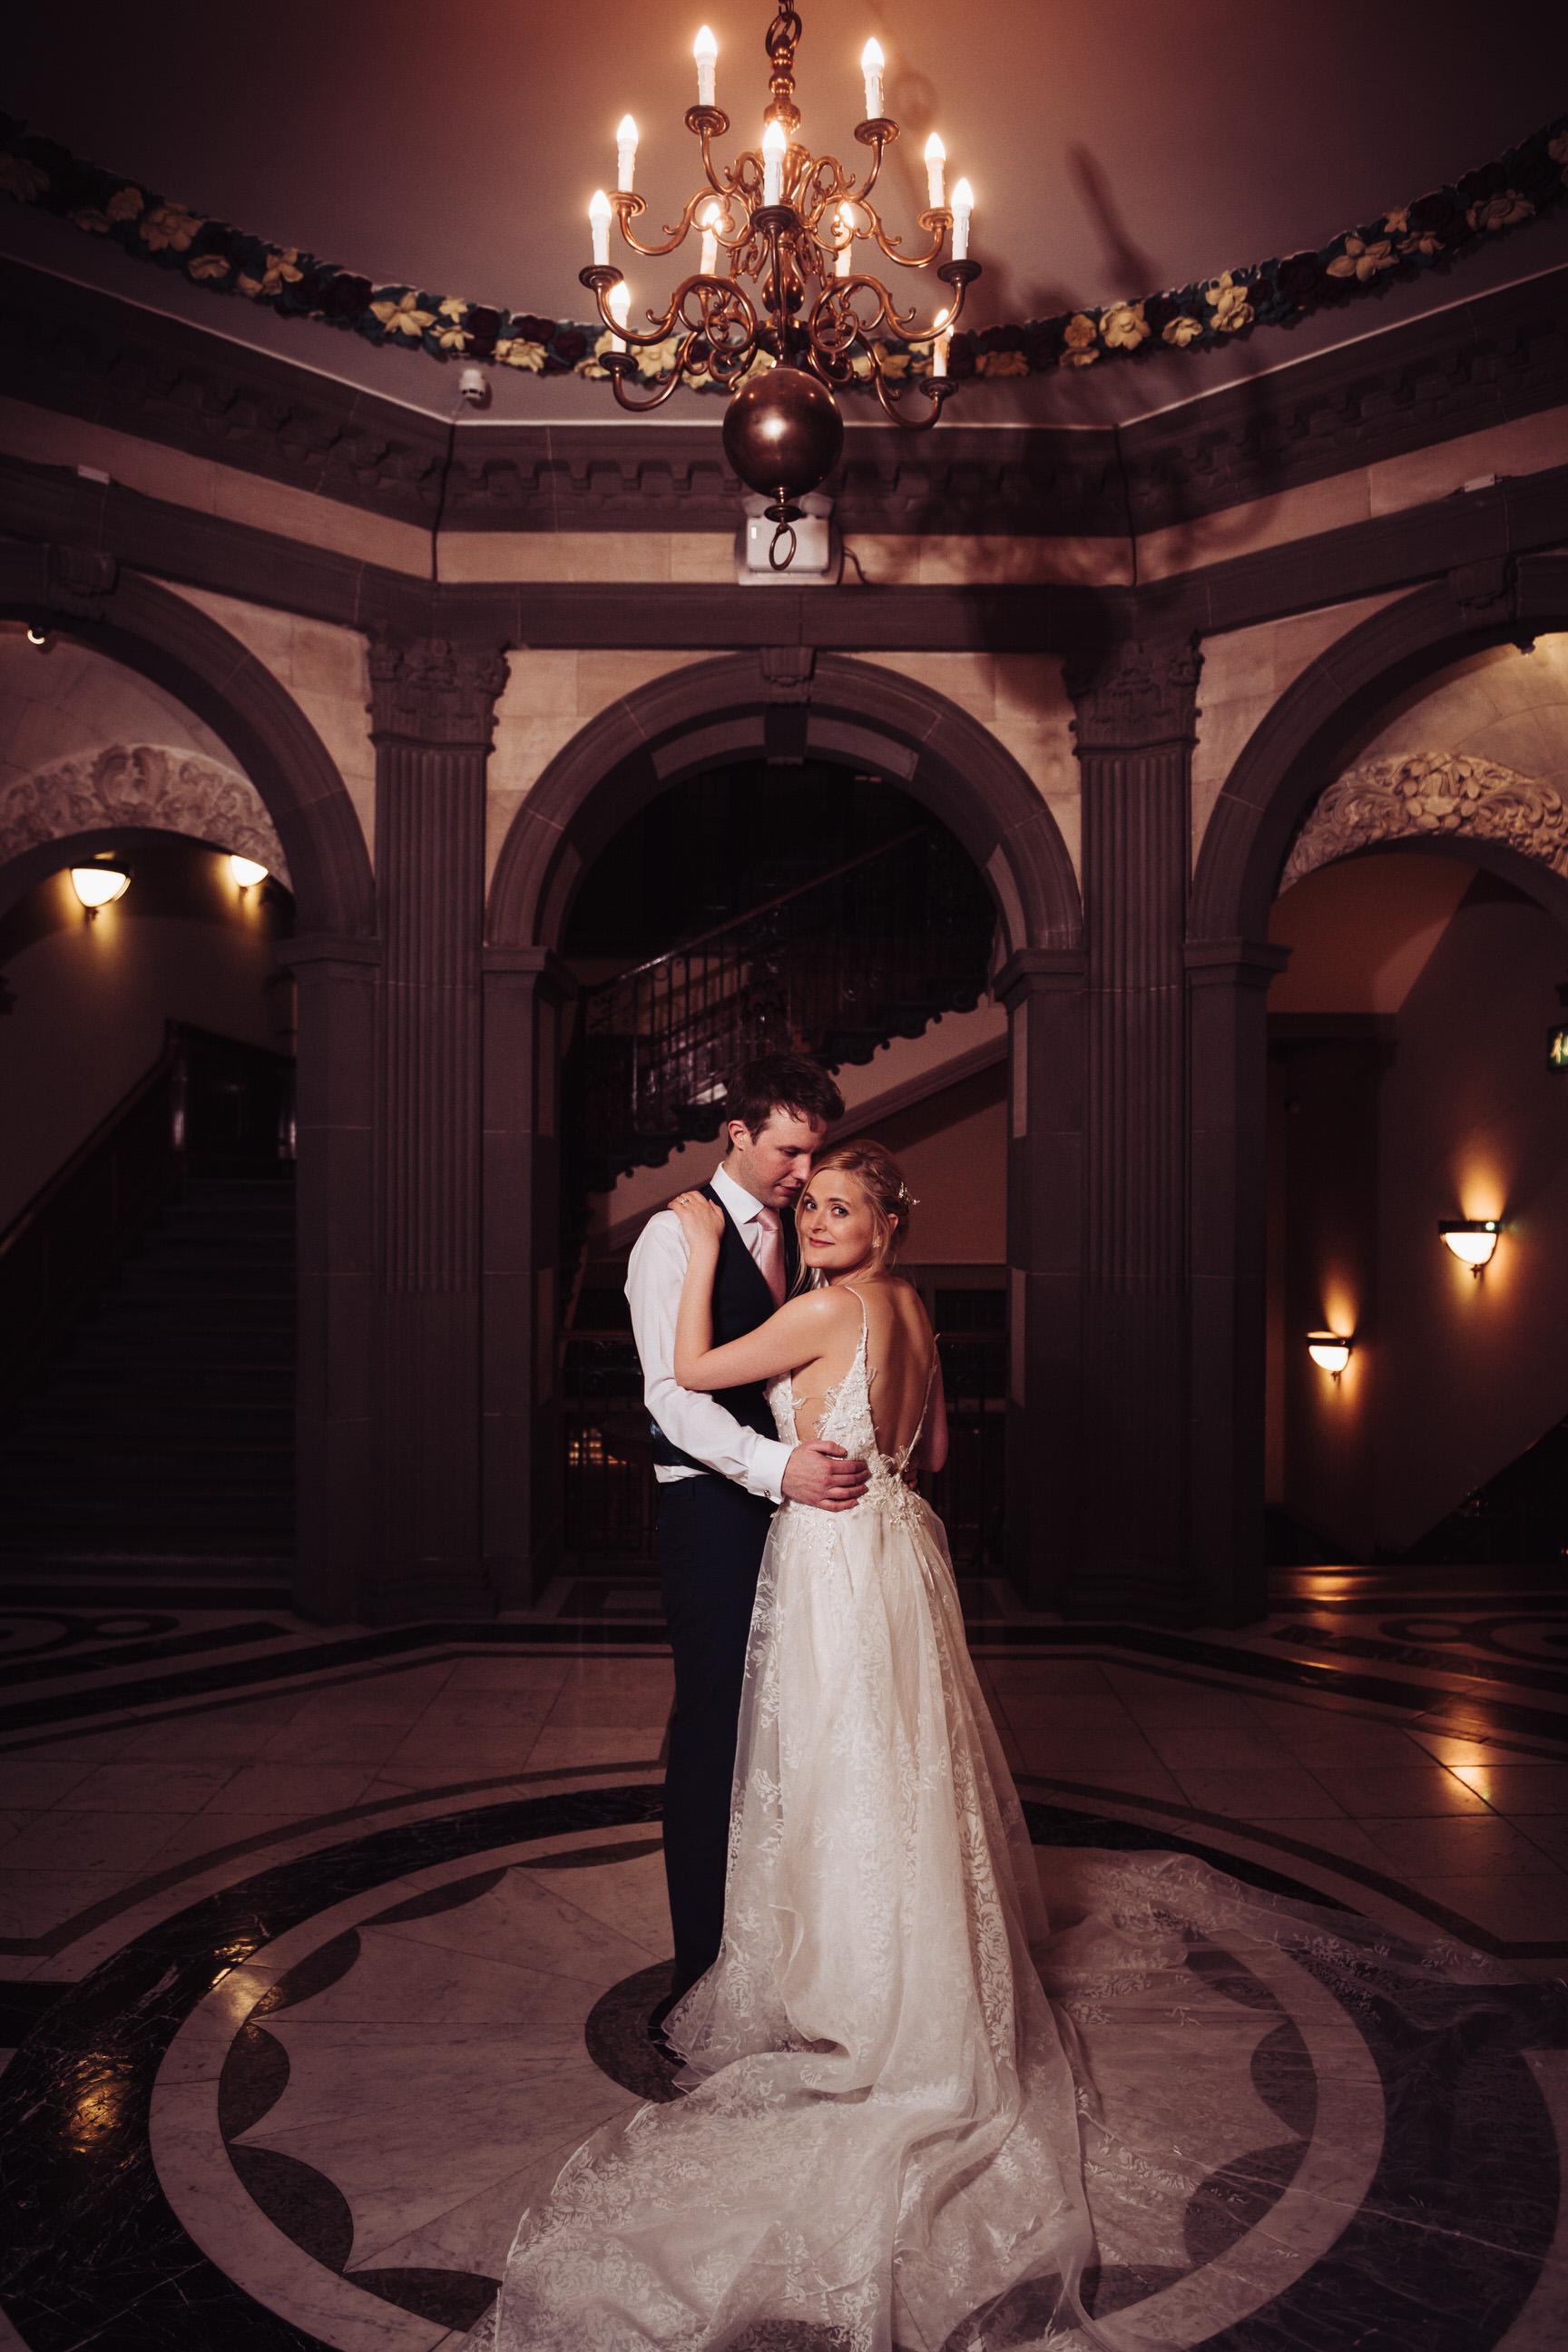 the-grand-hotel-york-wedding-photographer-52.jpg